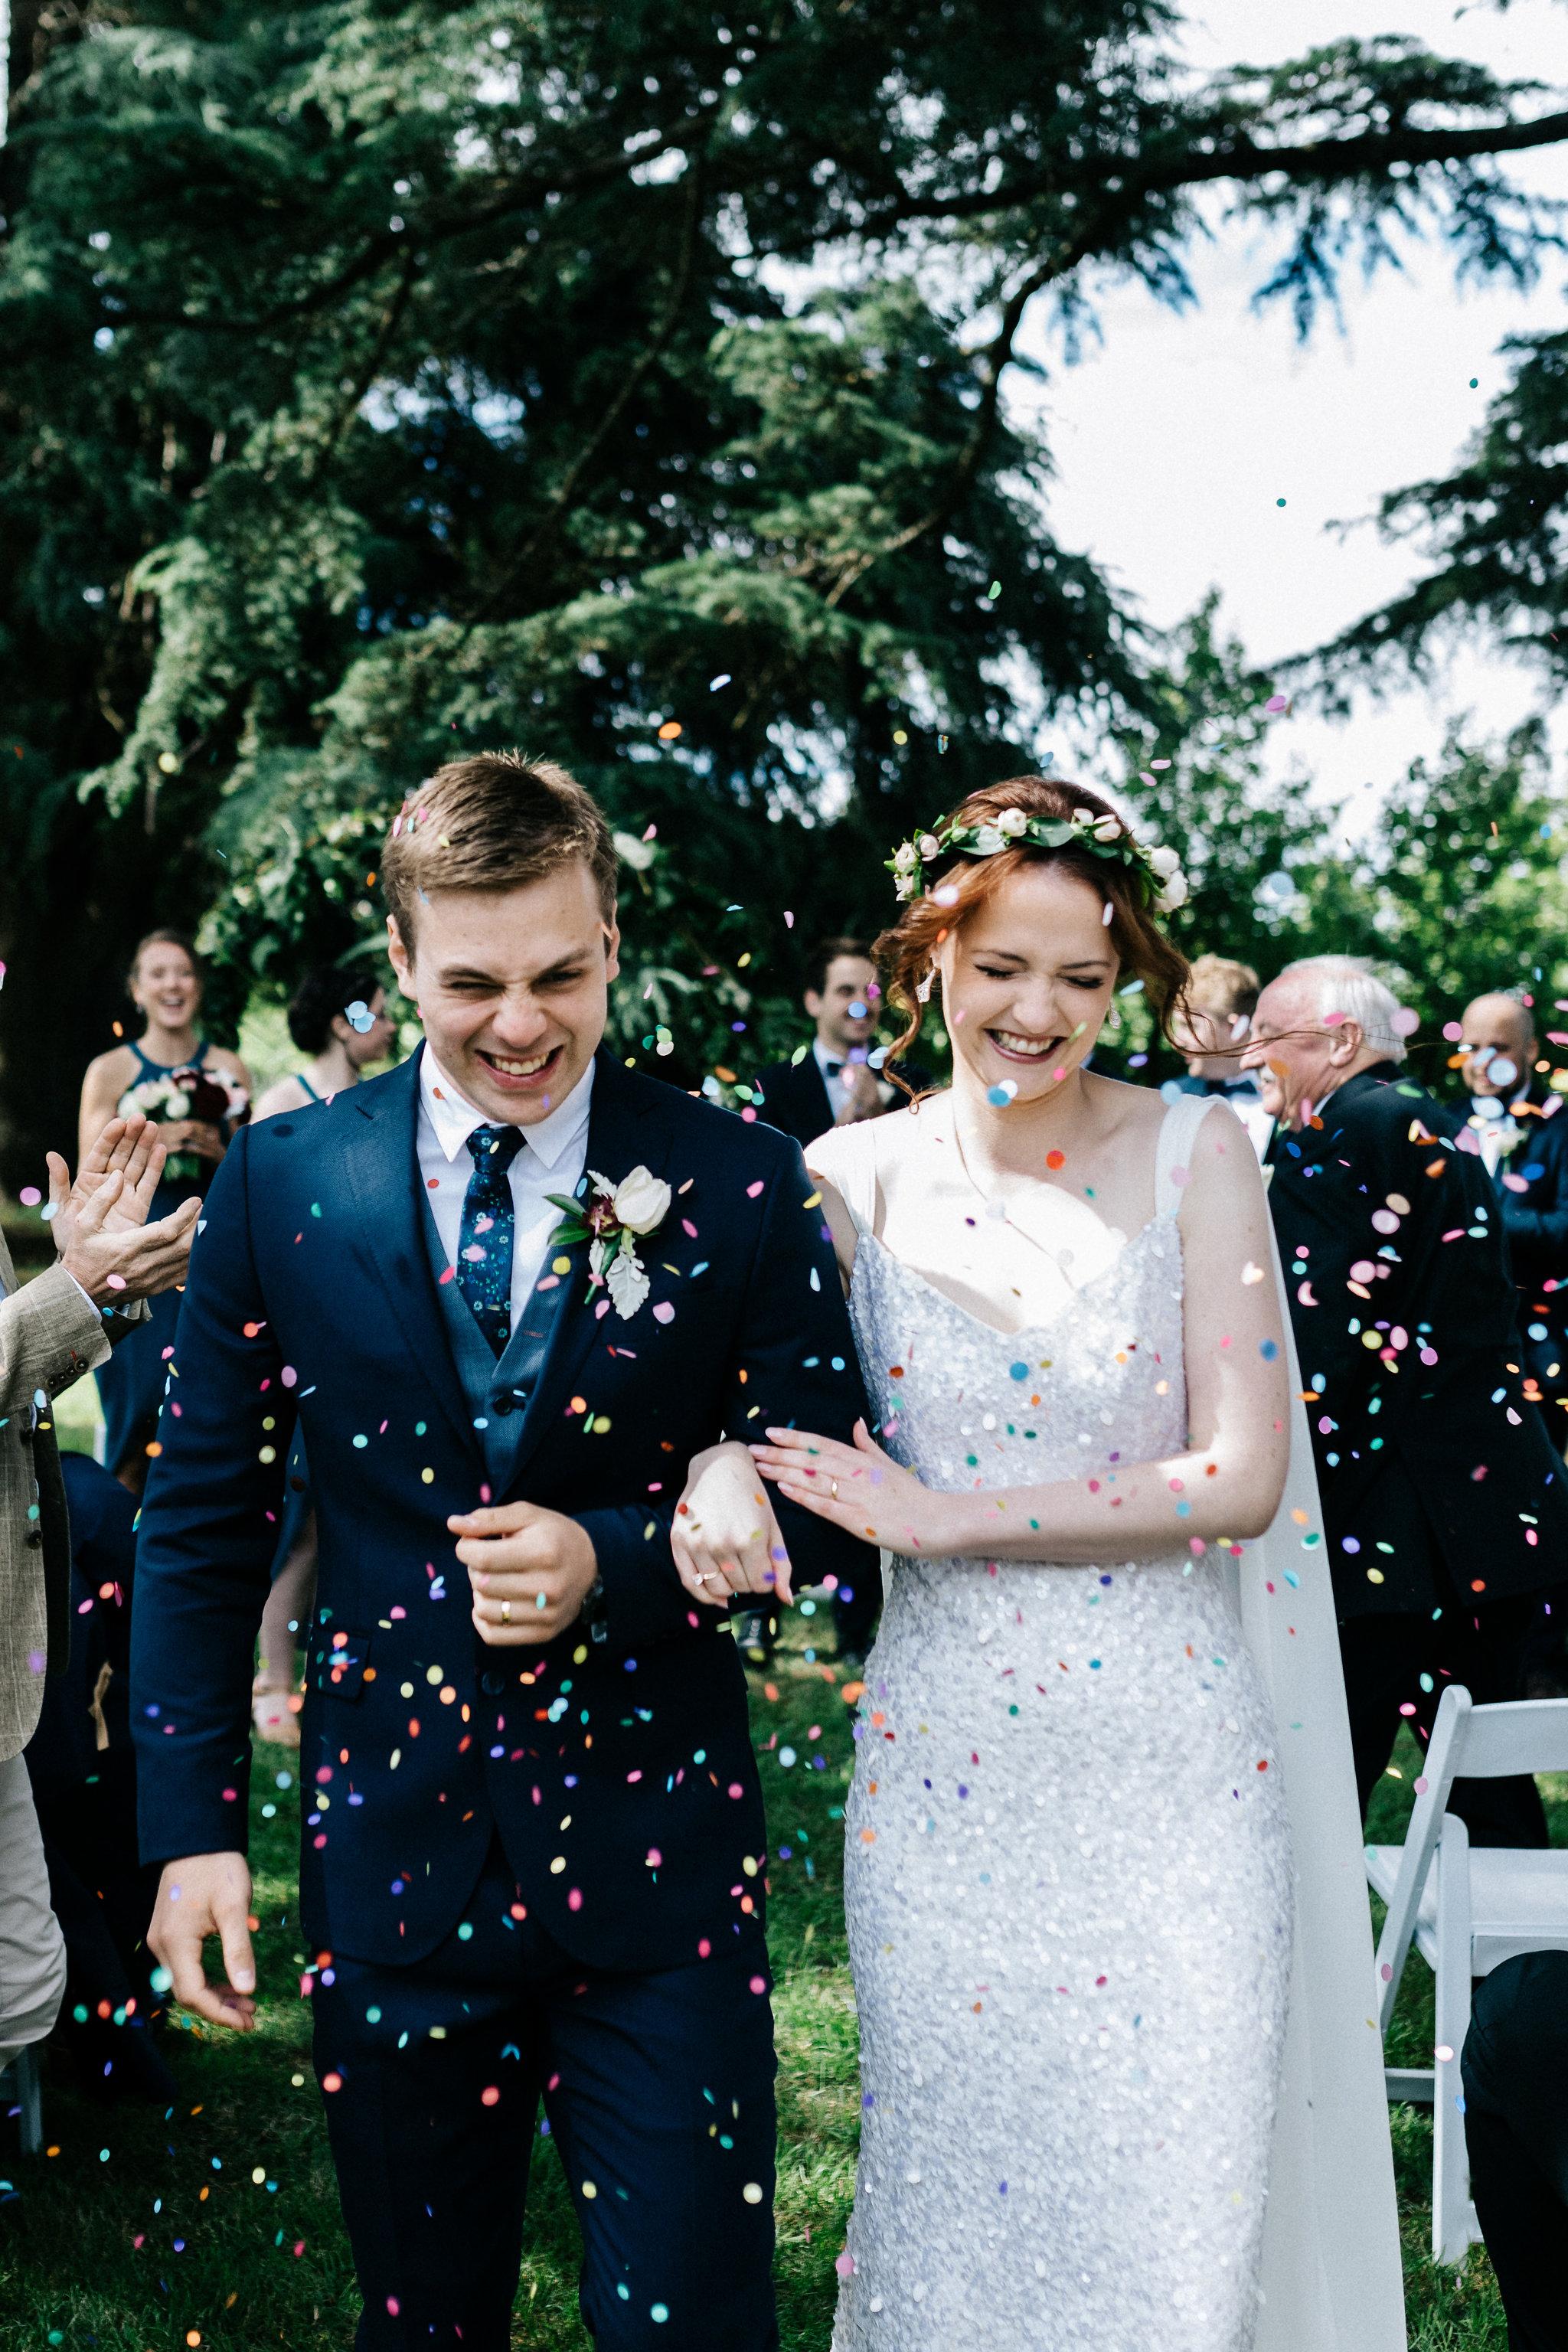 OUTDOOR WEDDING CONFETTI